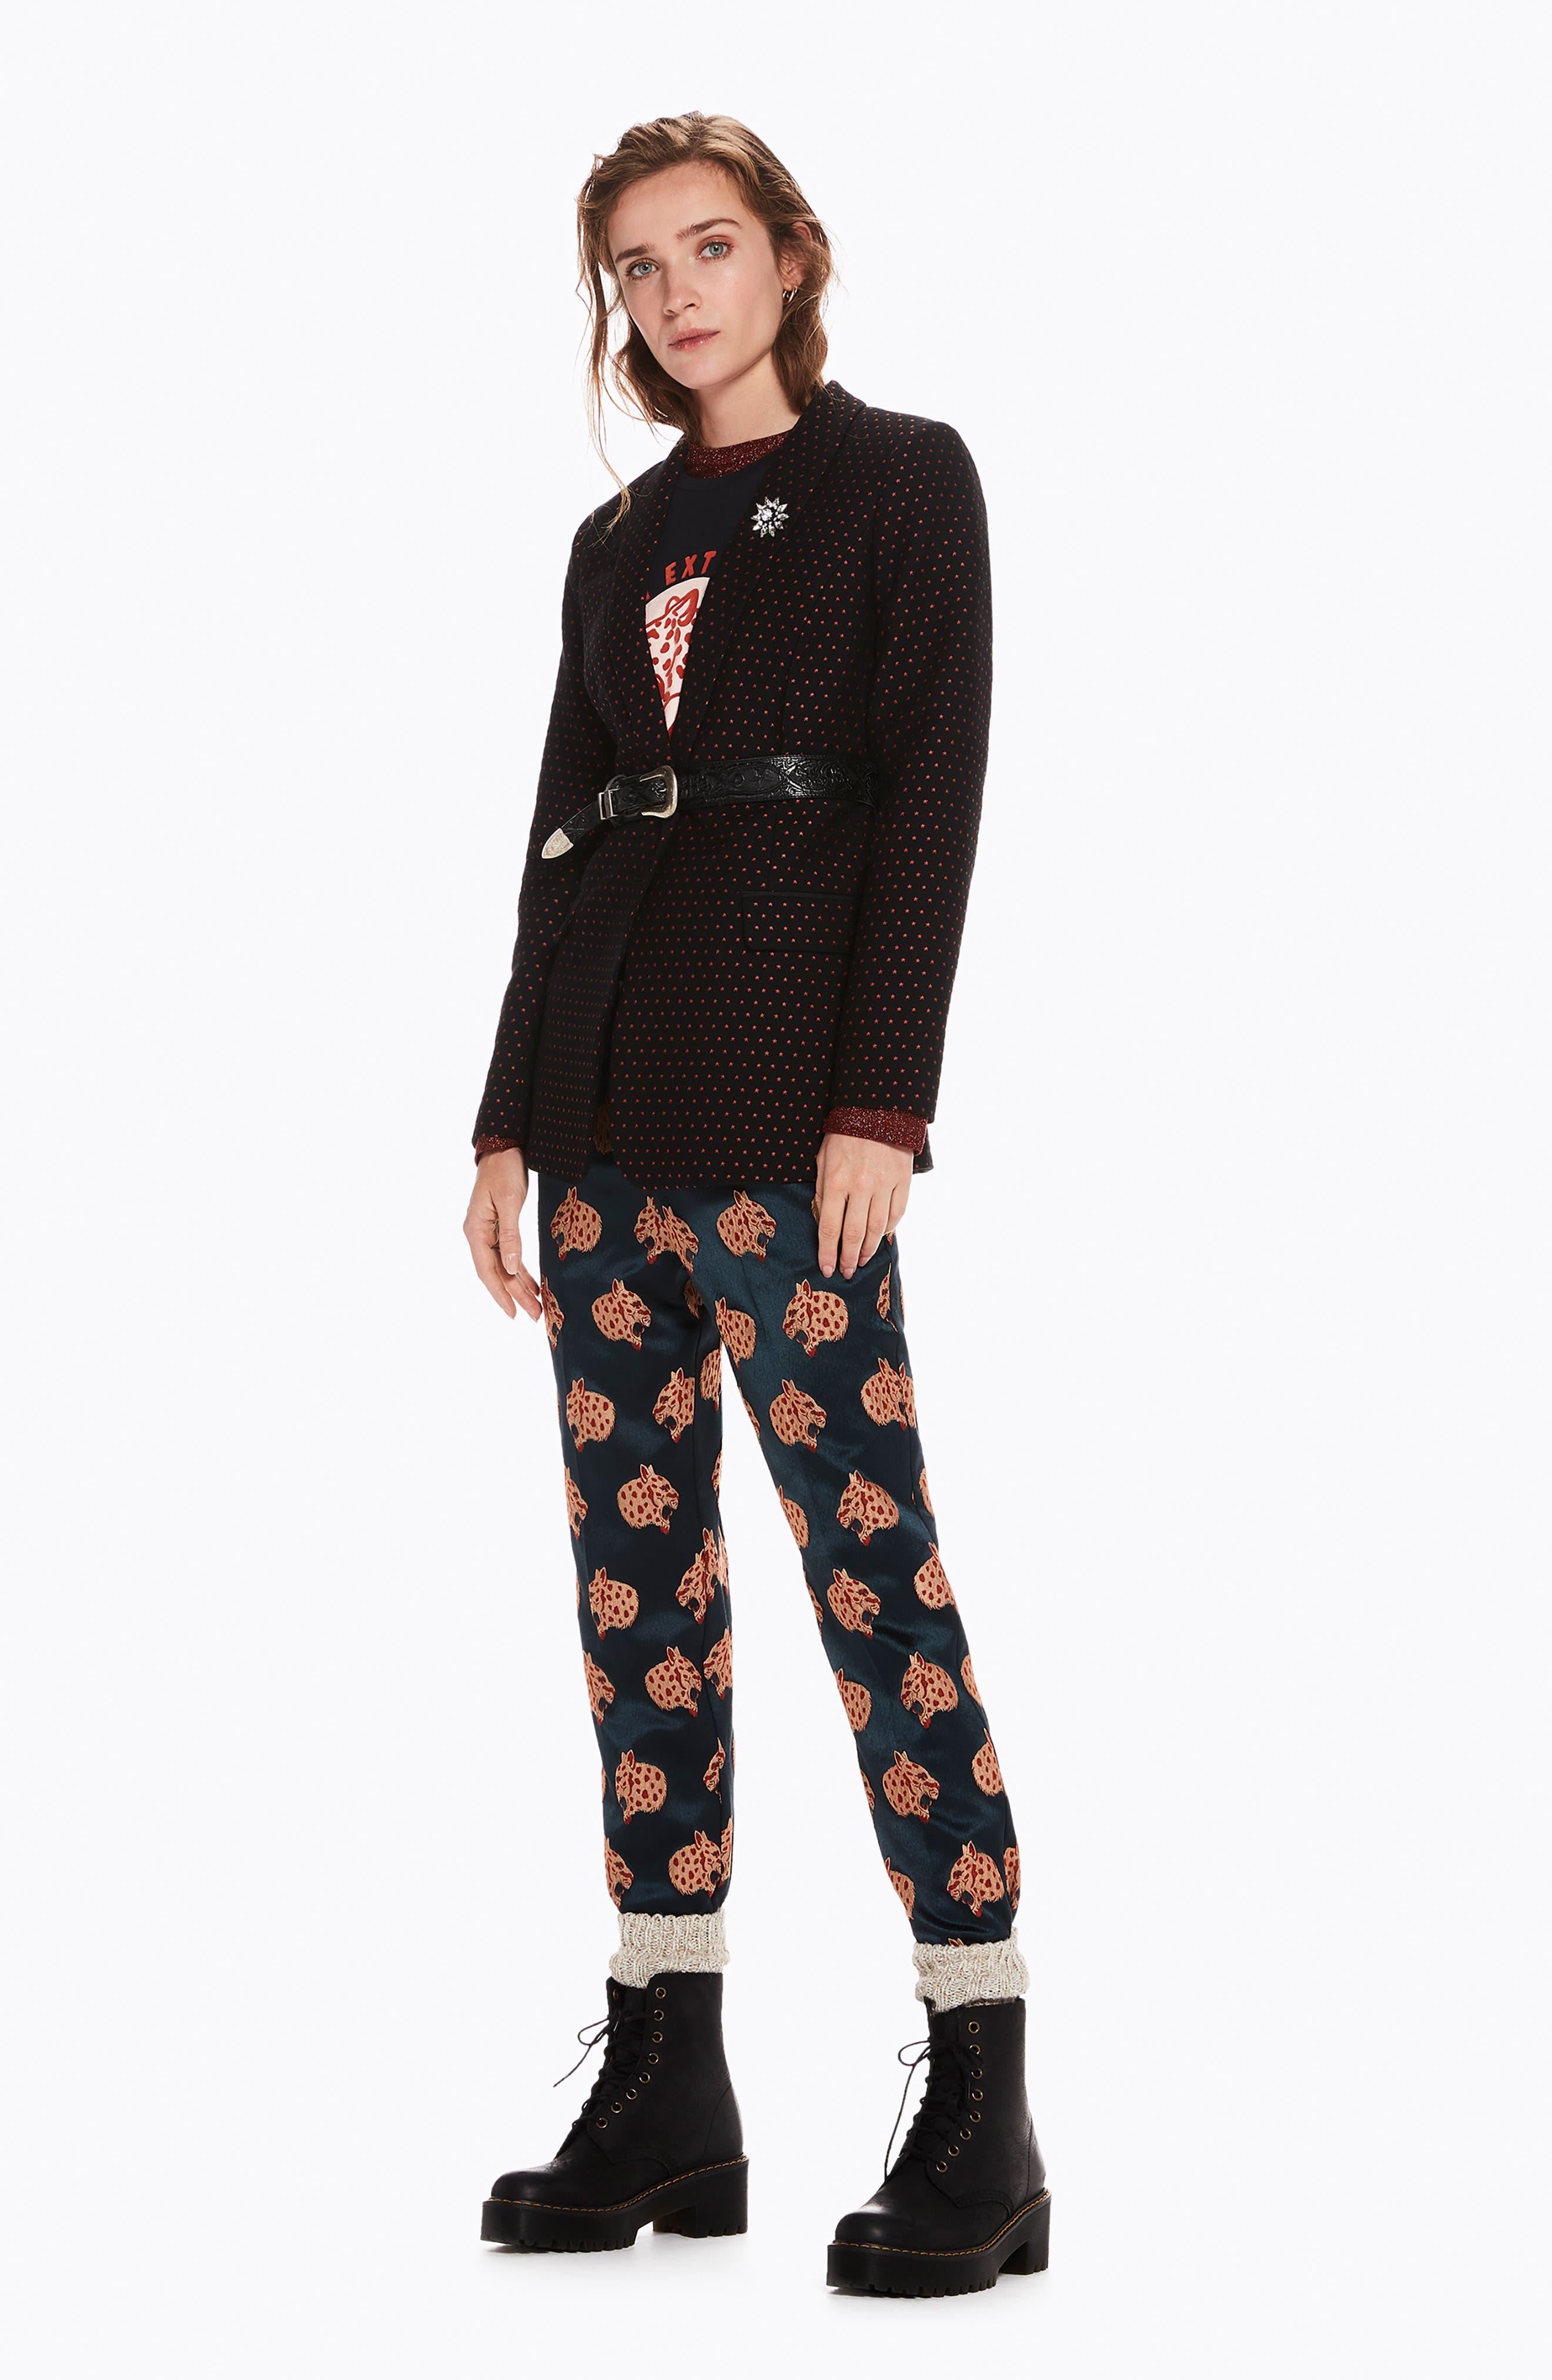 SCOTCH & SODA,                             Tailored Stretch Jacquard Blazer,                             Alternate thumbnail 4, color,                             BLACK W/ SMALL STAR PRINT